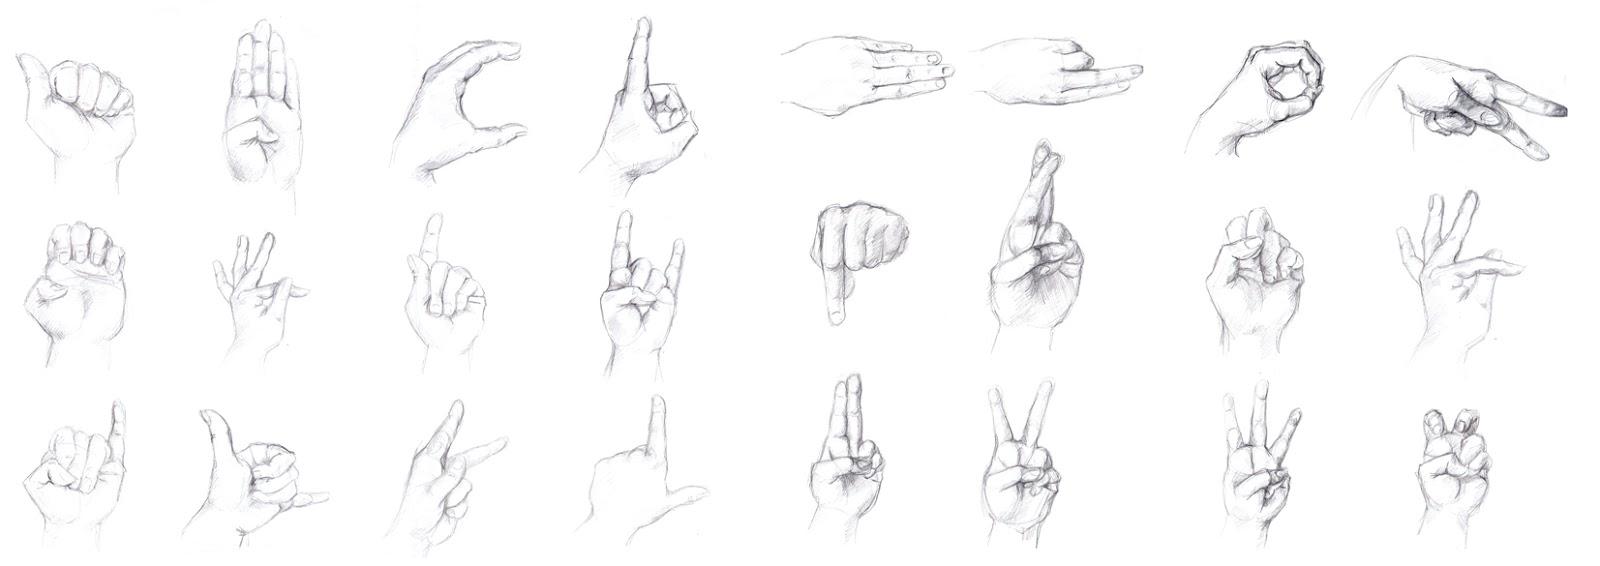 manu lafay dessin main langage des signes